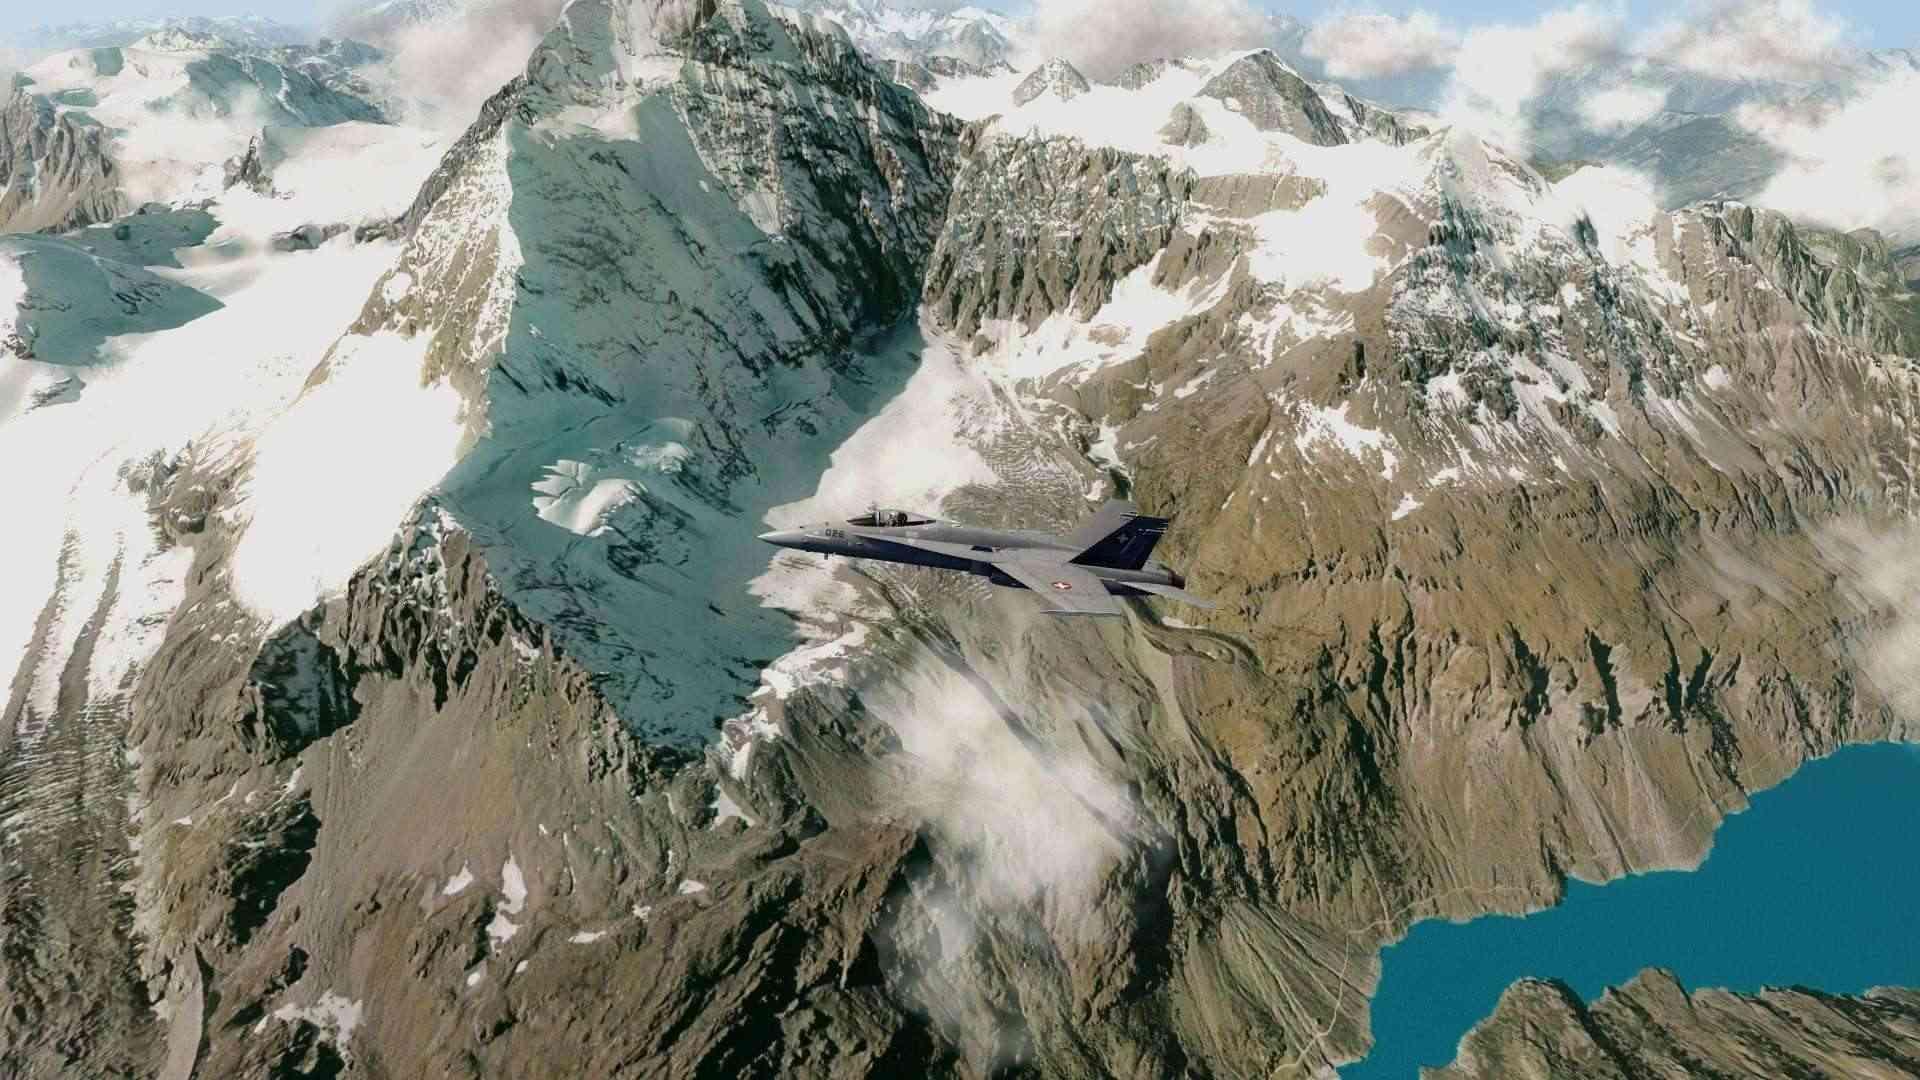 Meilleur que FSX : Aerofly FS - Page 2 Aerofl12